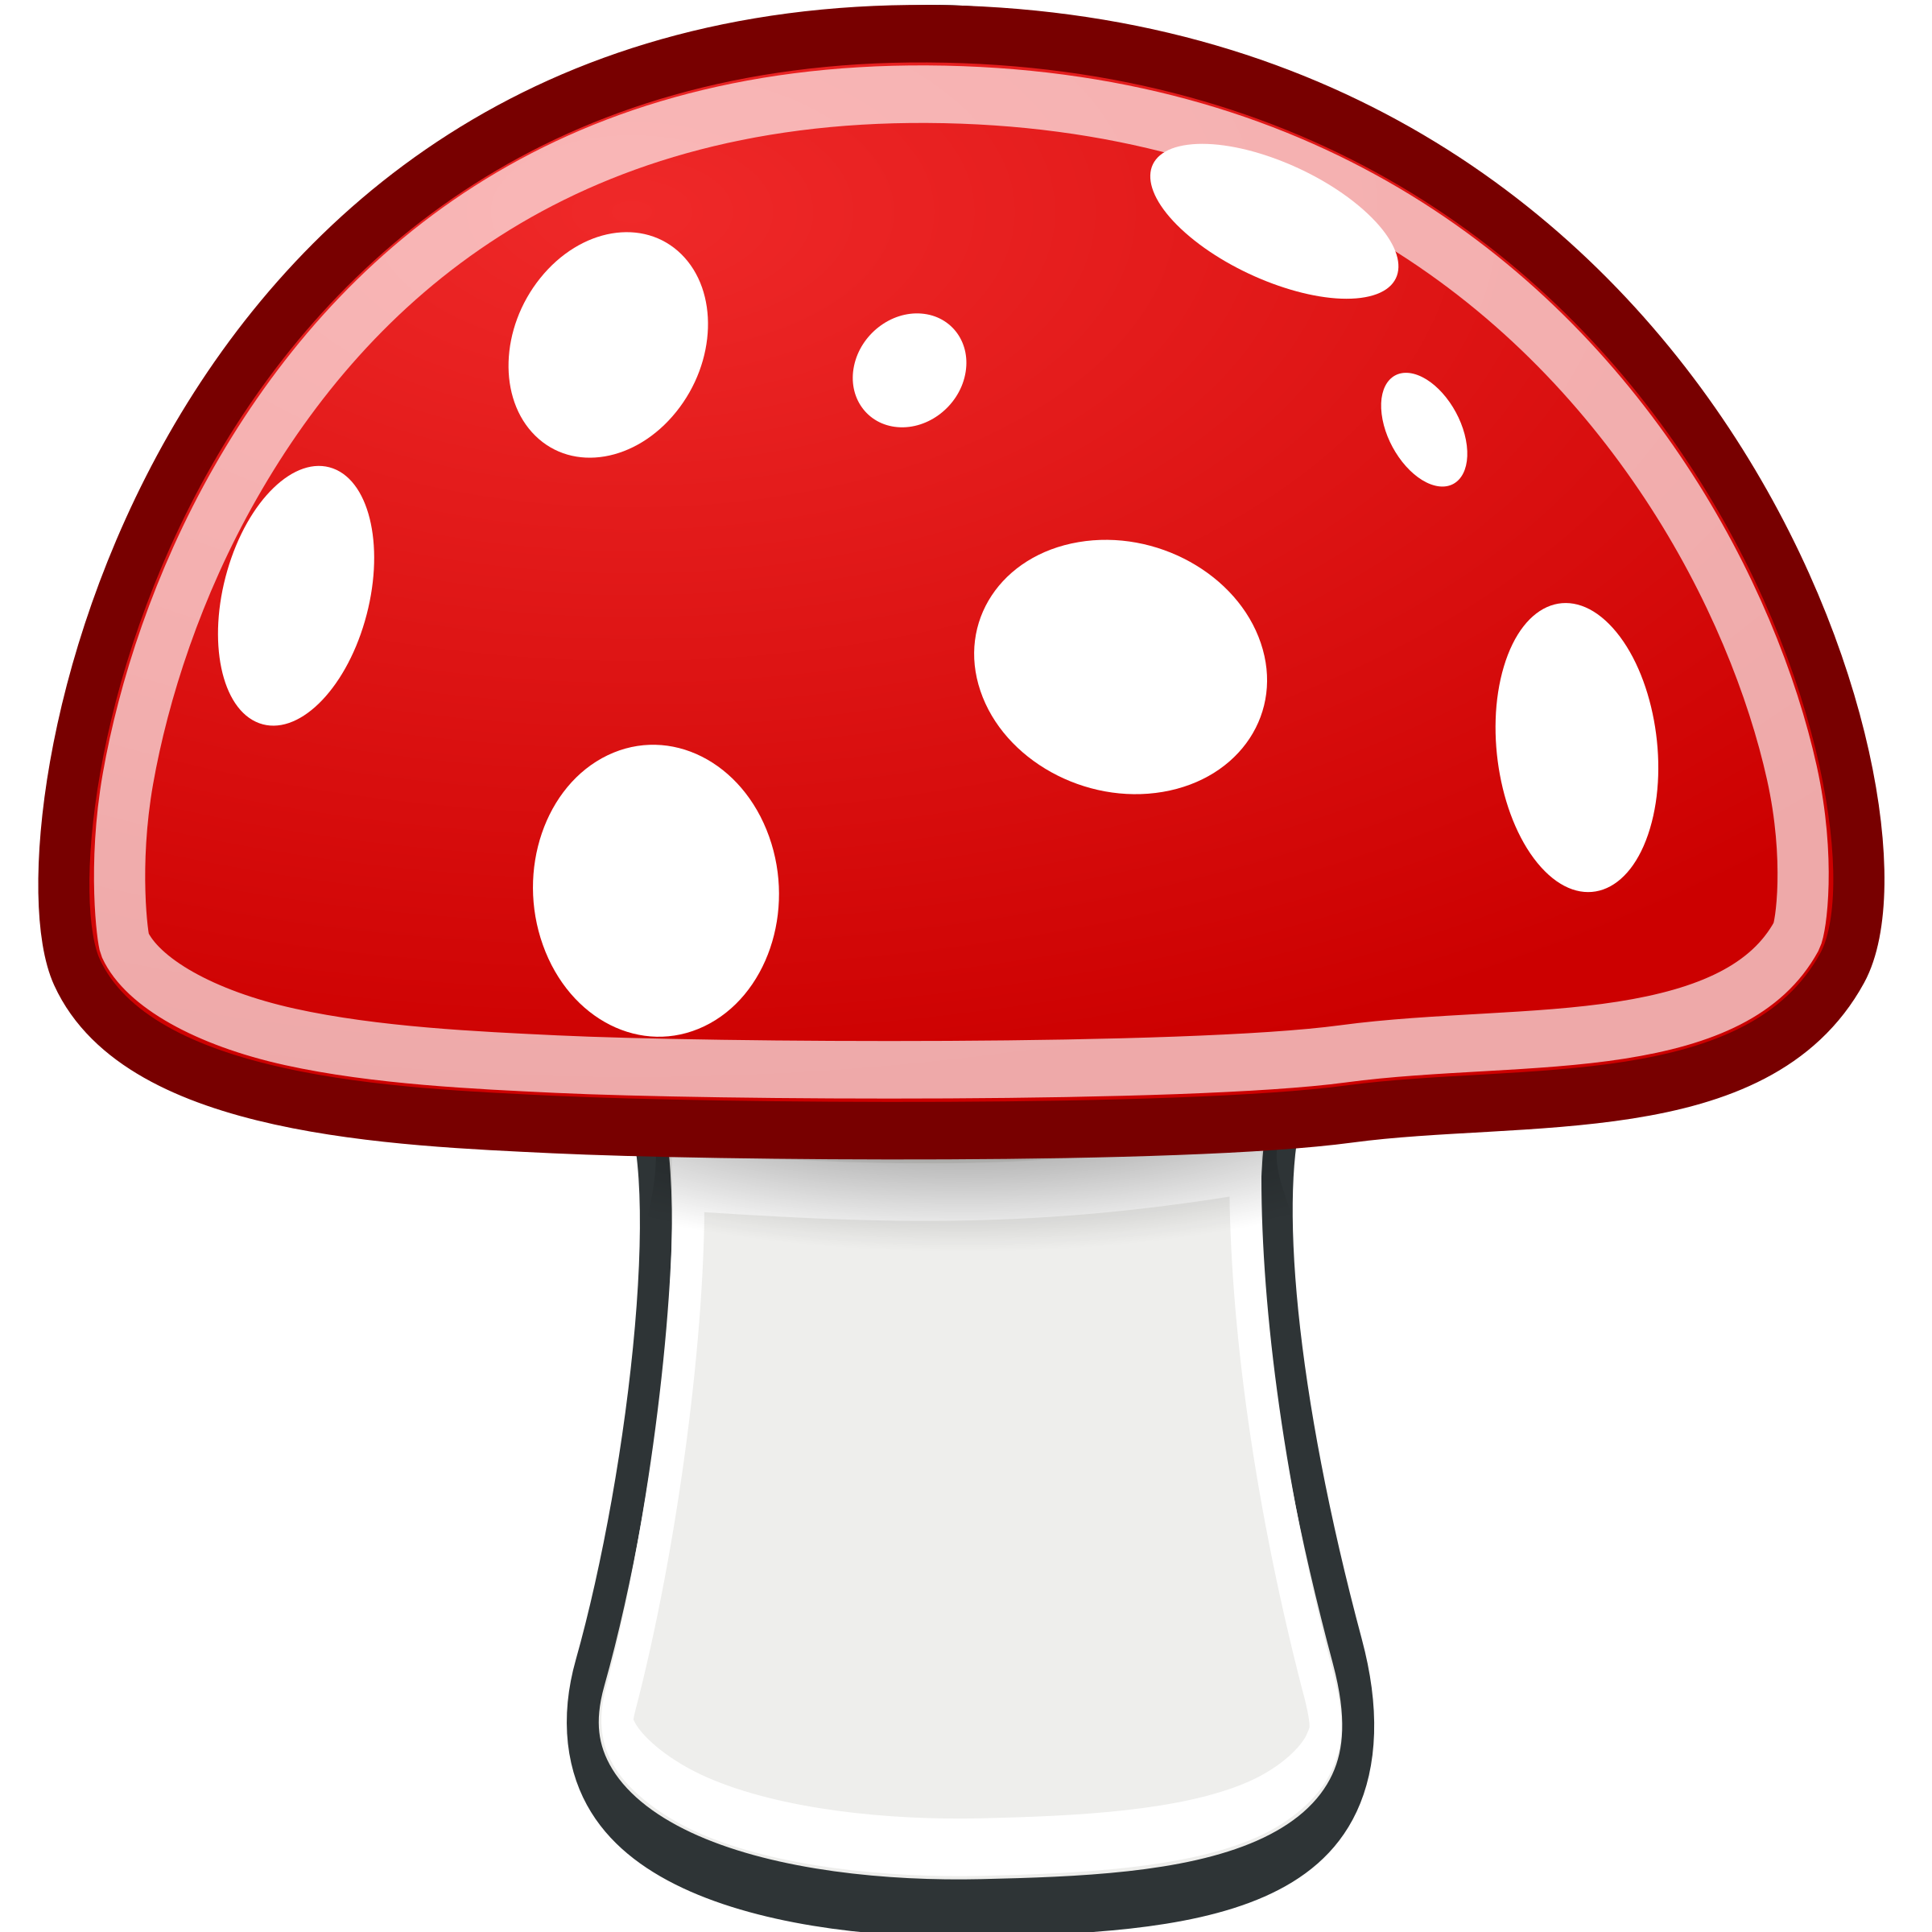 Tango style mushroom big. Mushrooms clipart fungus